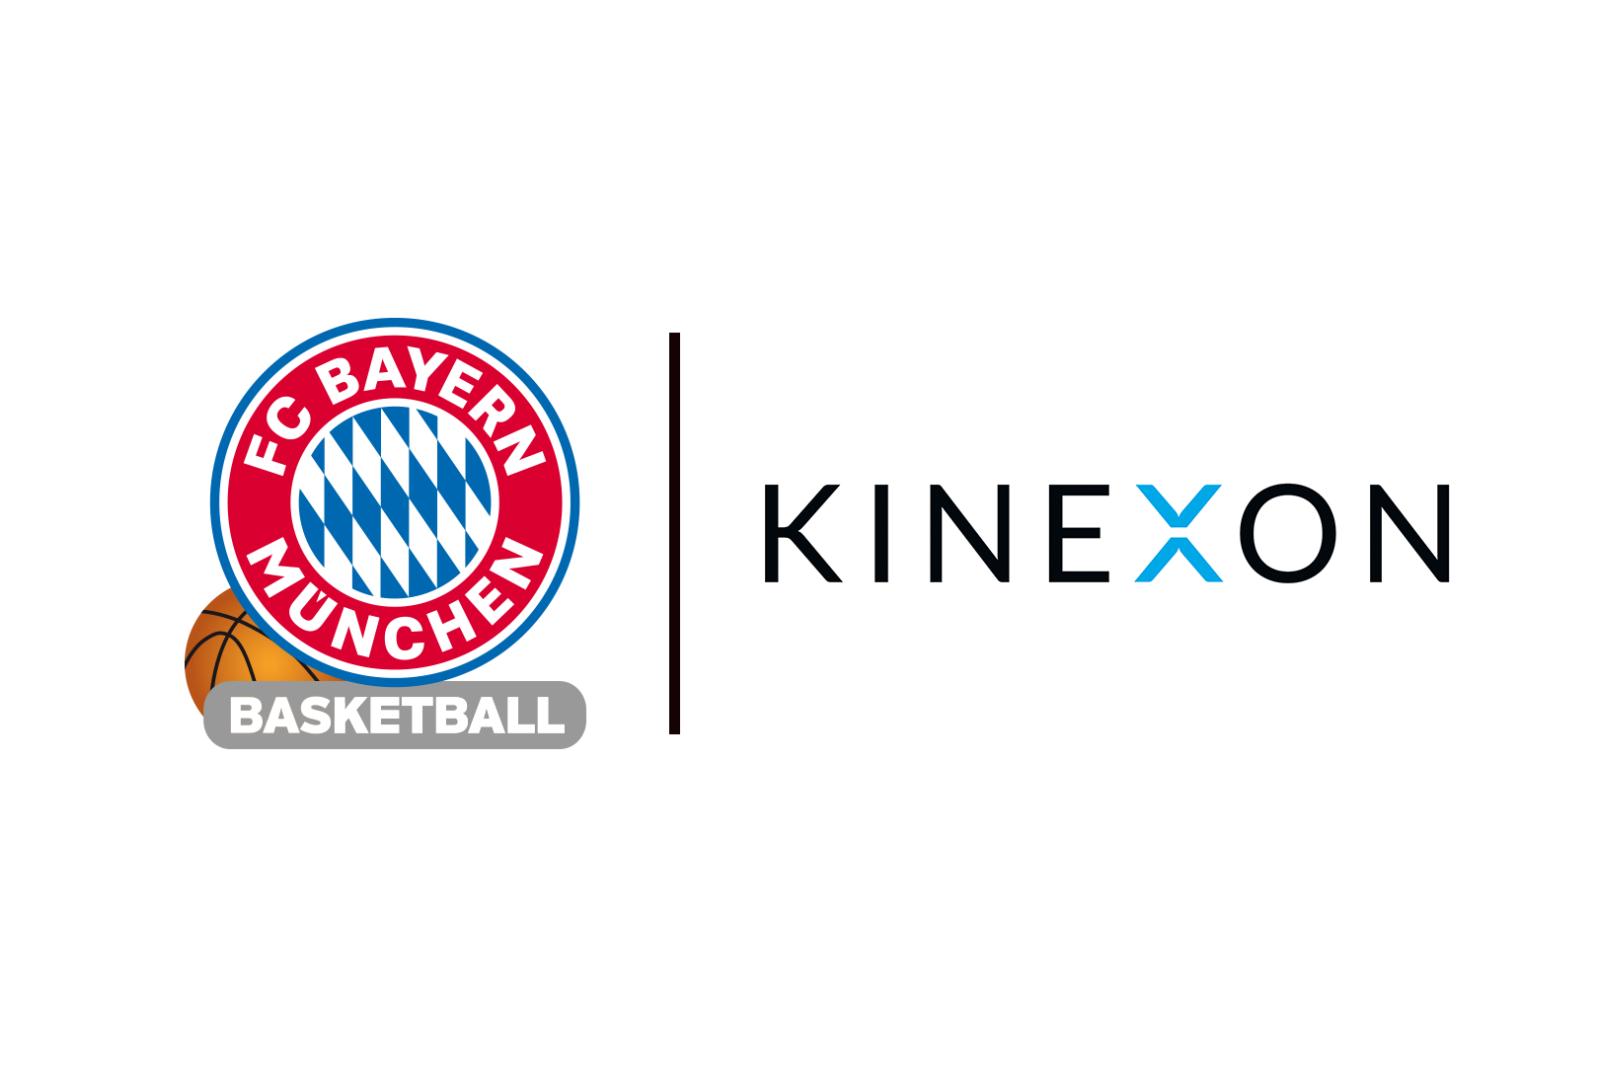 KINEXON_FCBB_Composite-Logo_2018_1920x1080p